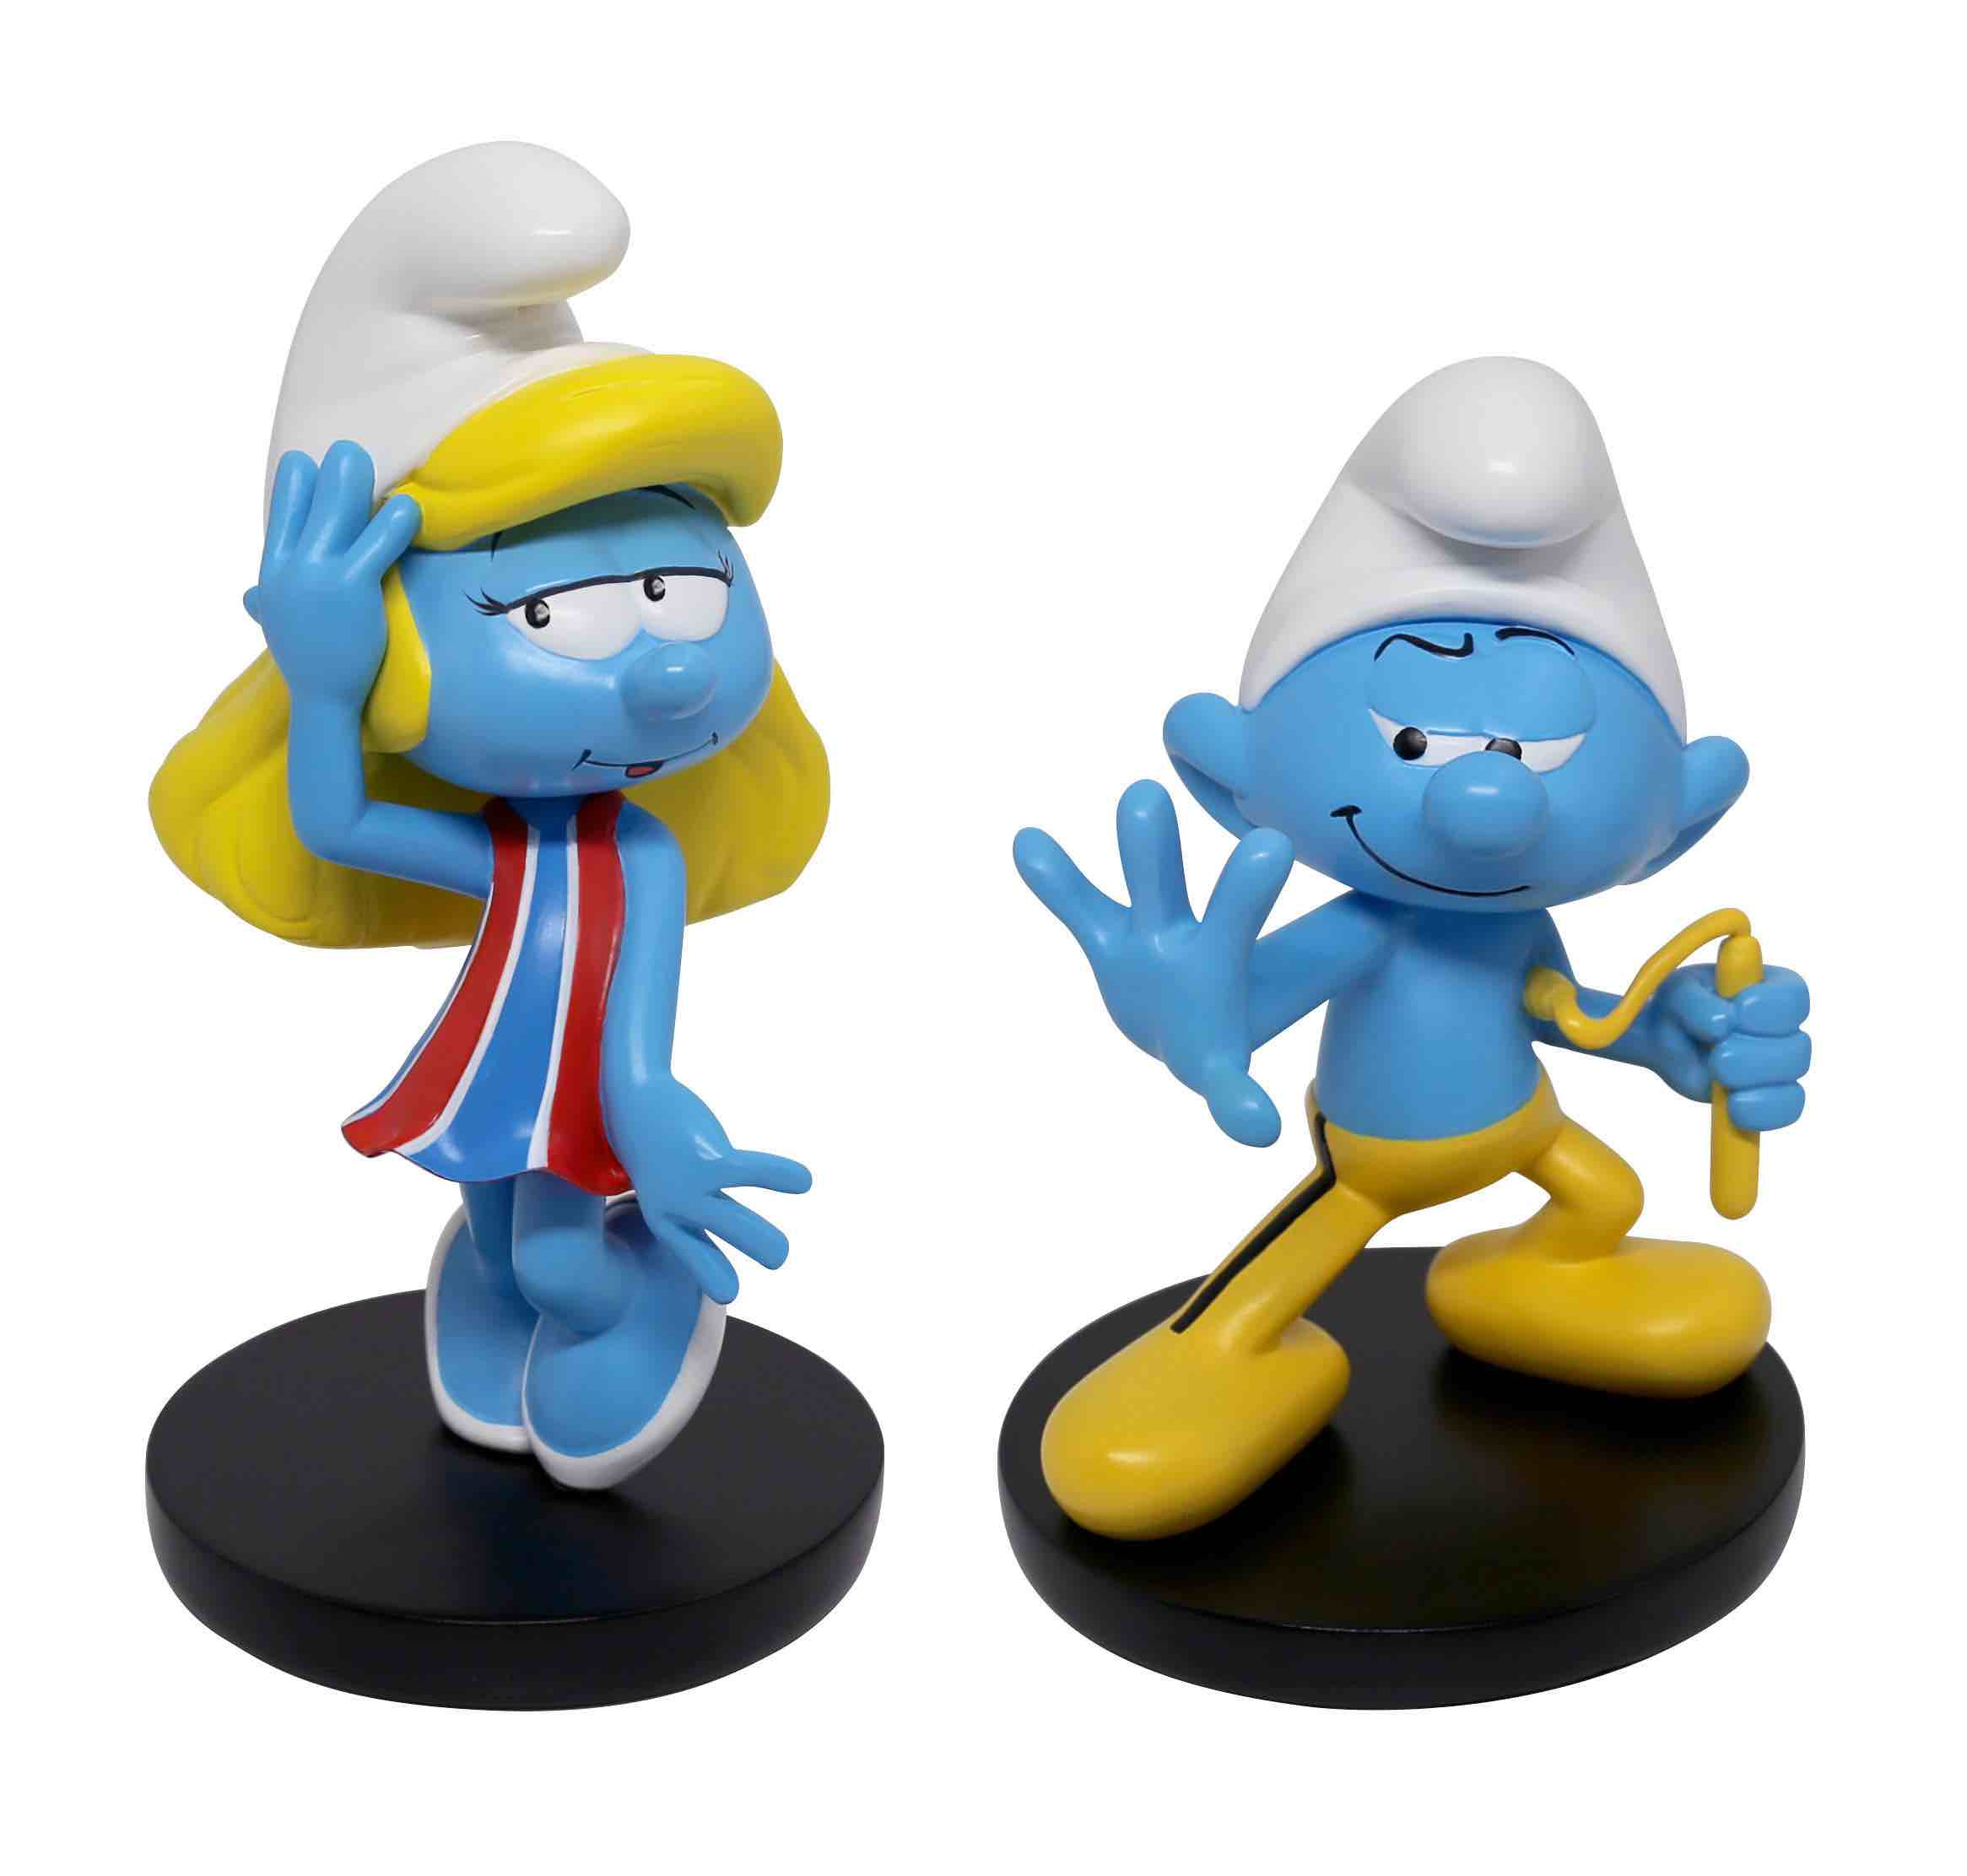 Smurf Figure HK Special Edition - AspirantSG